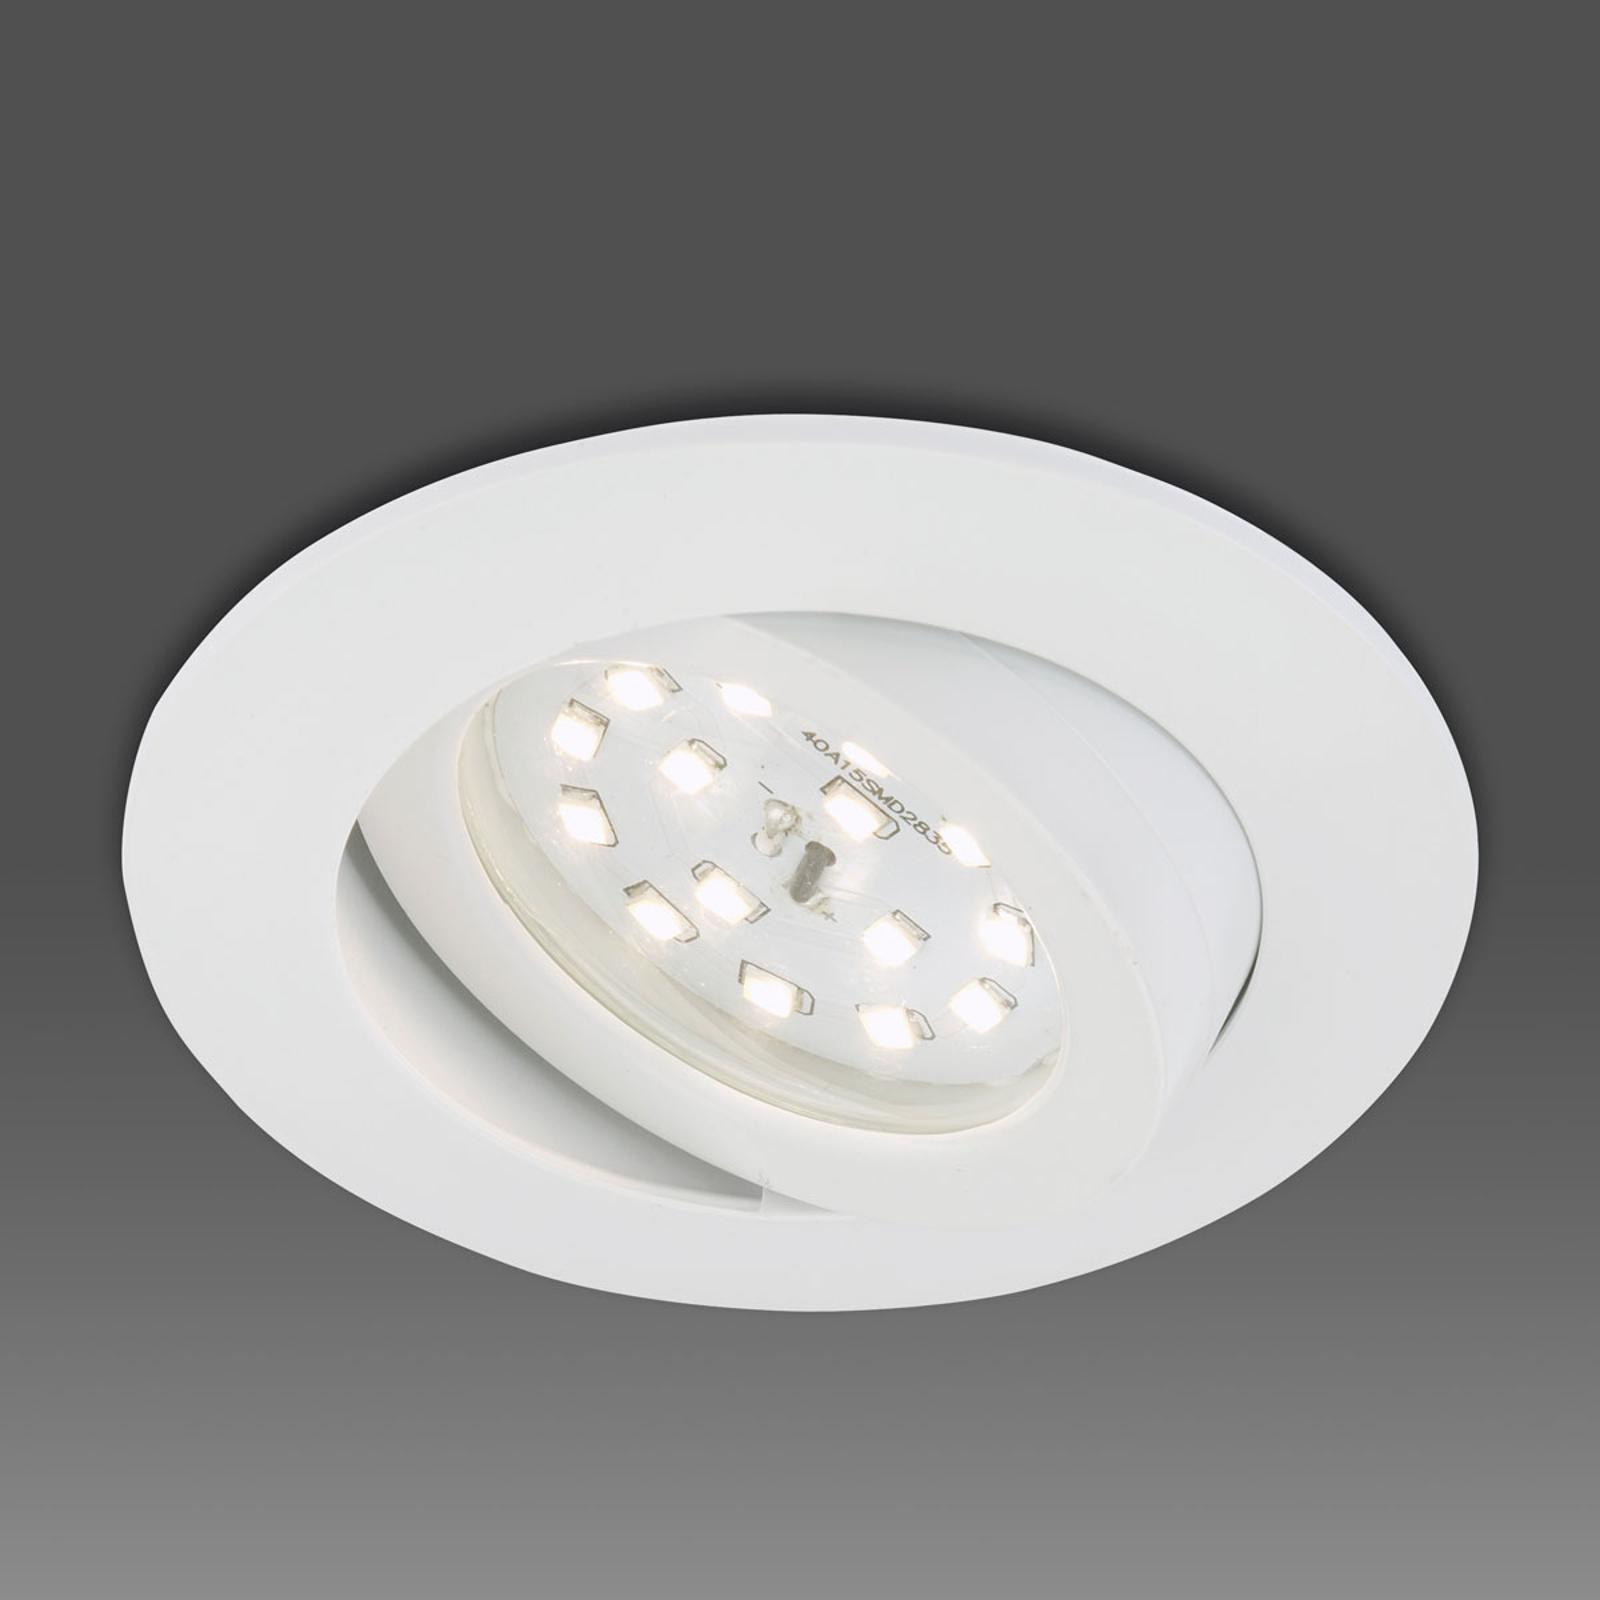 Svingbart LED-indbygningsspot Erik, hvid